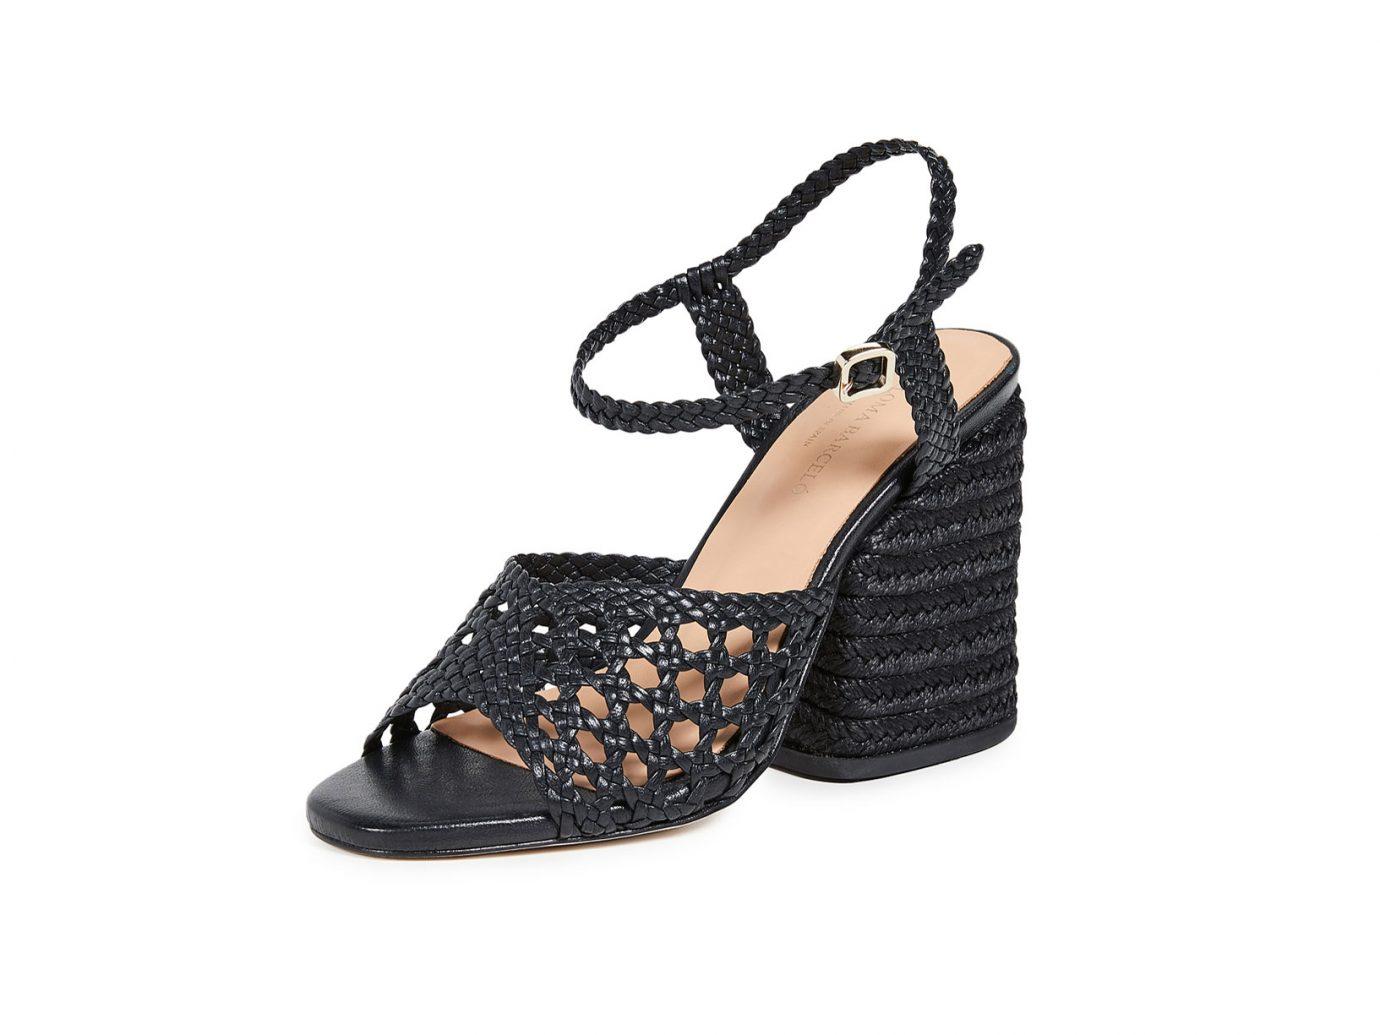 Paloma Barcelo Verane Sandals